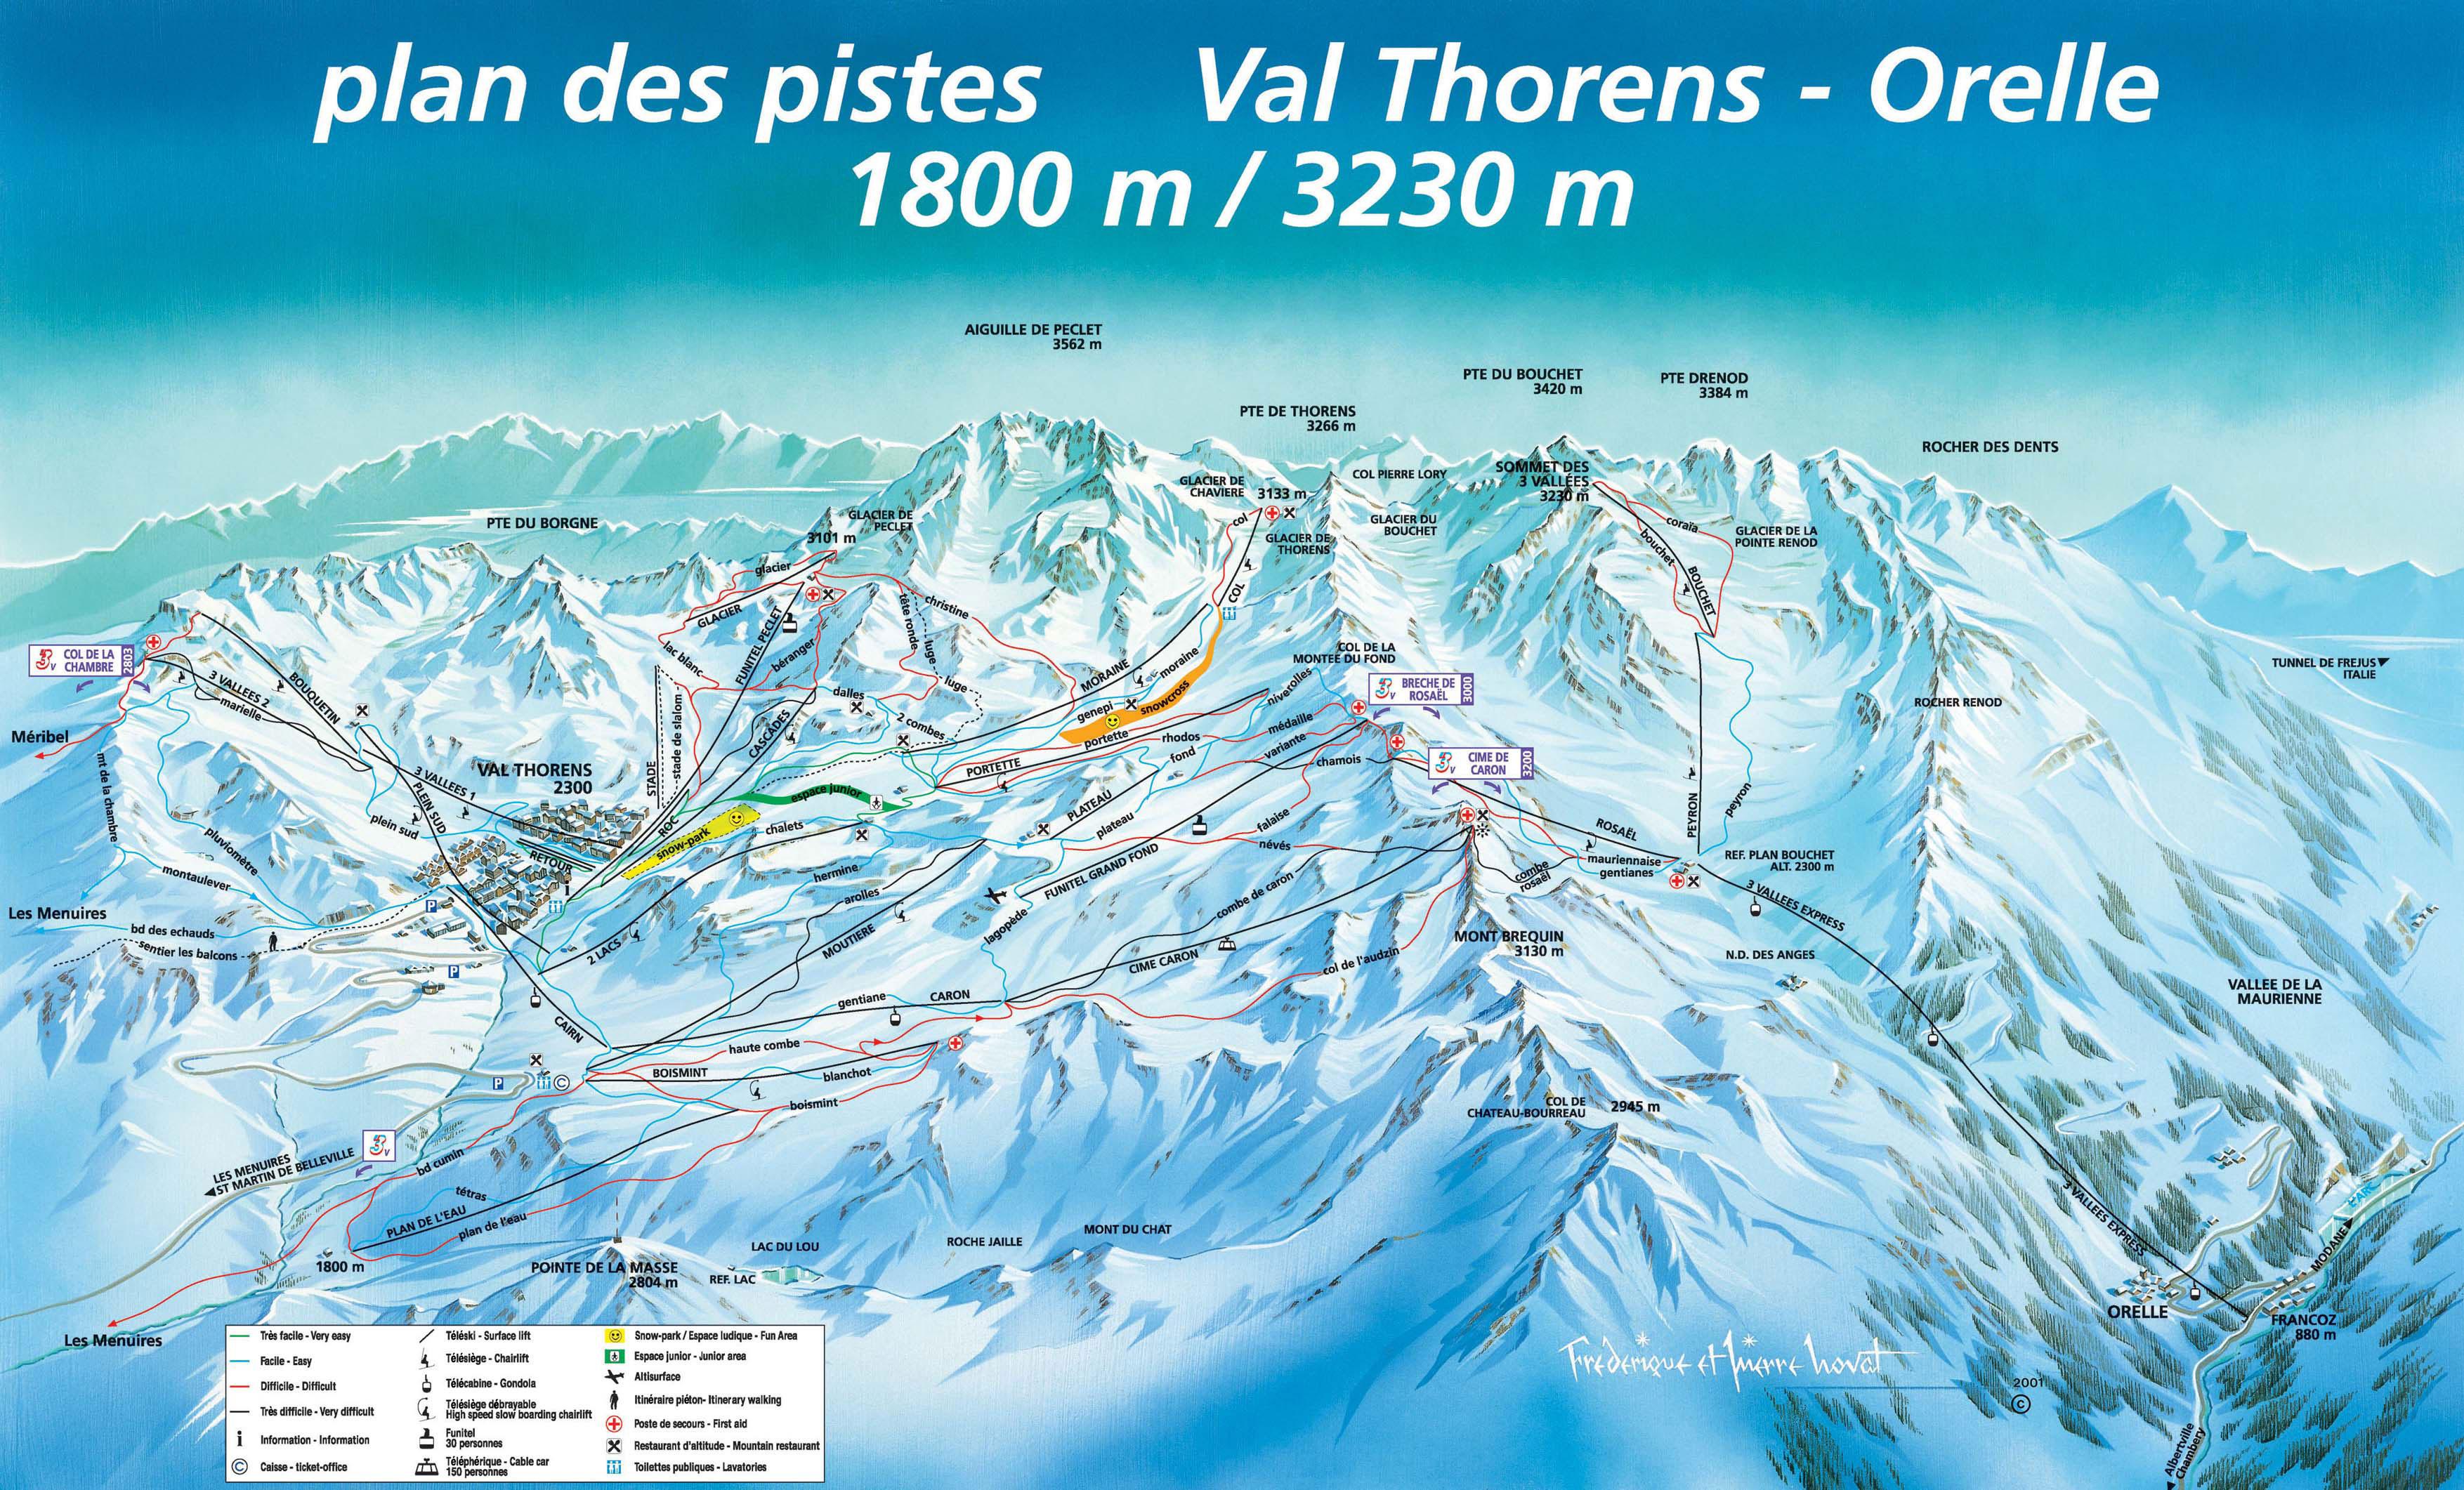 zimovanje/francuska/Val-Thorens/val-thorens-2.jpg